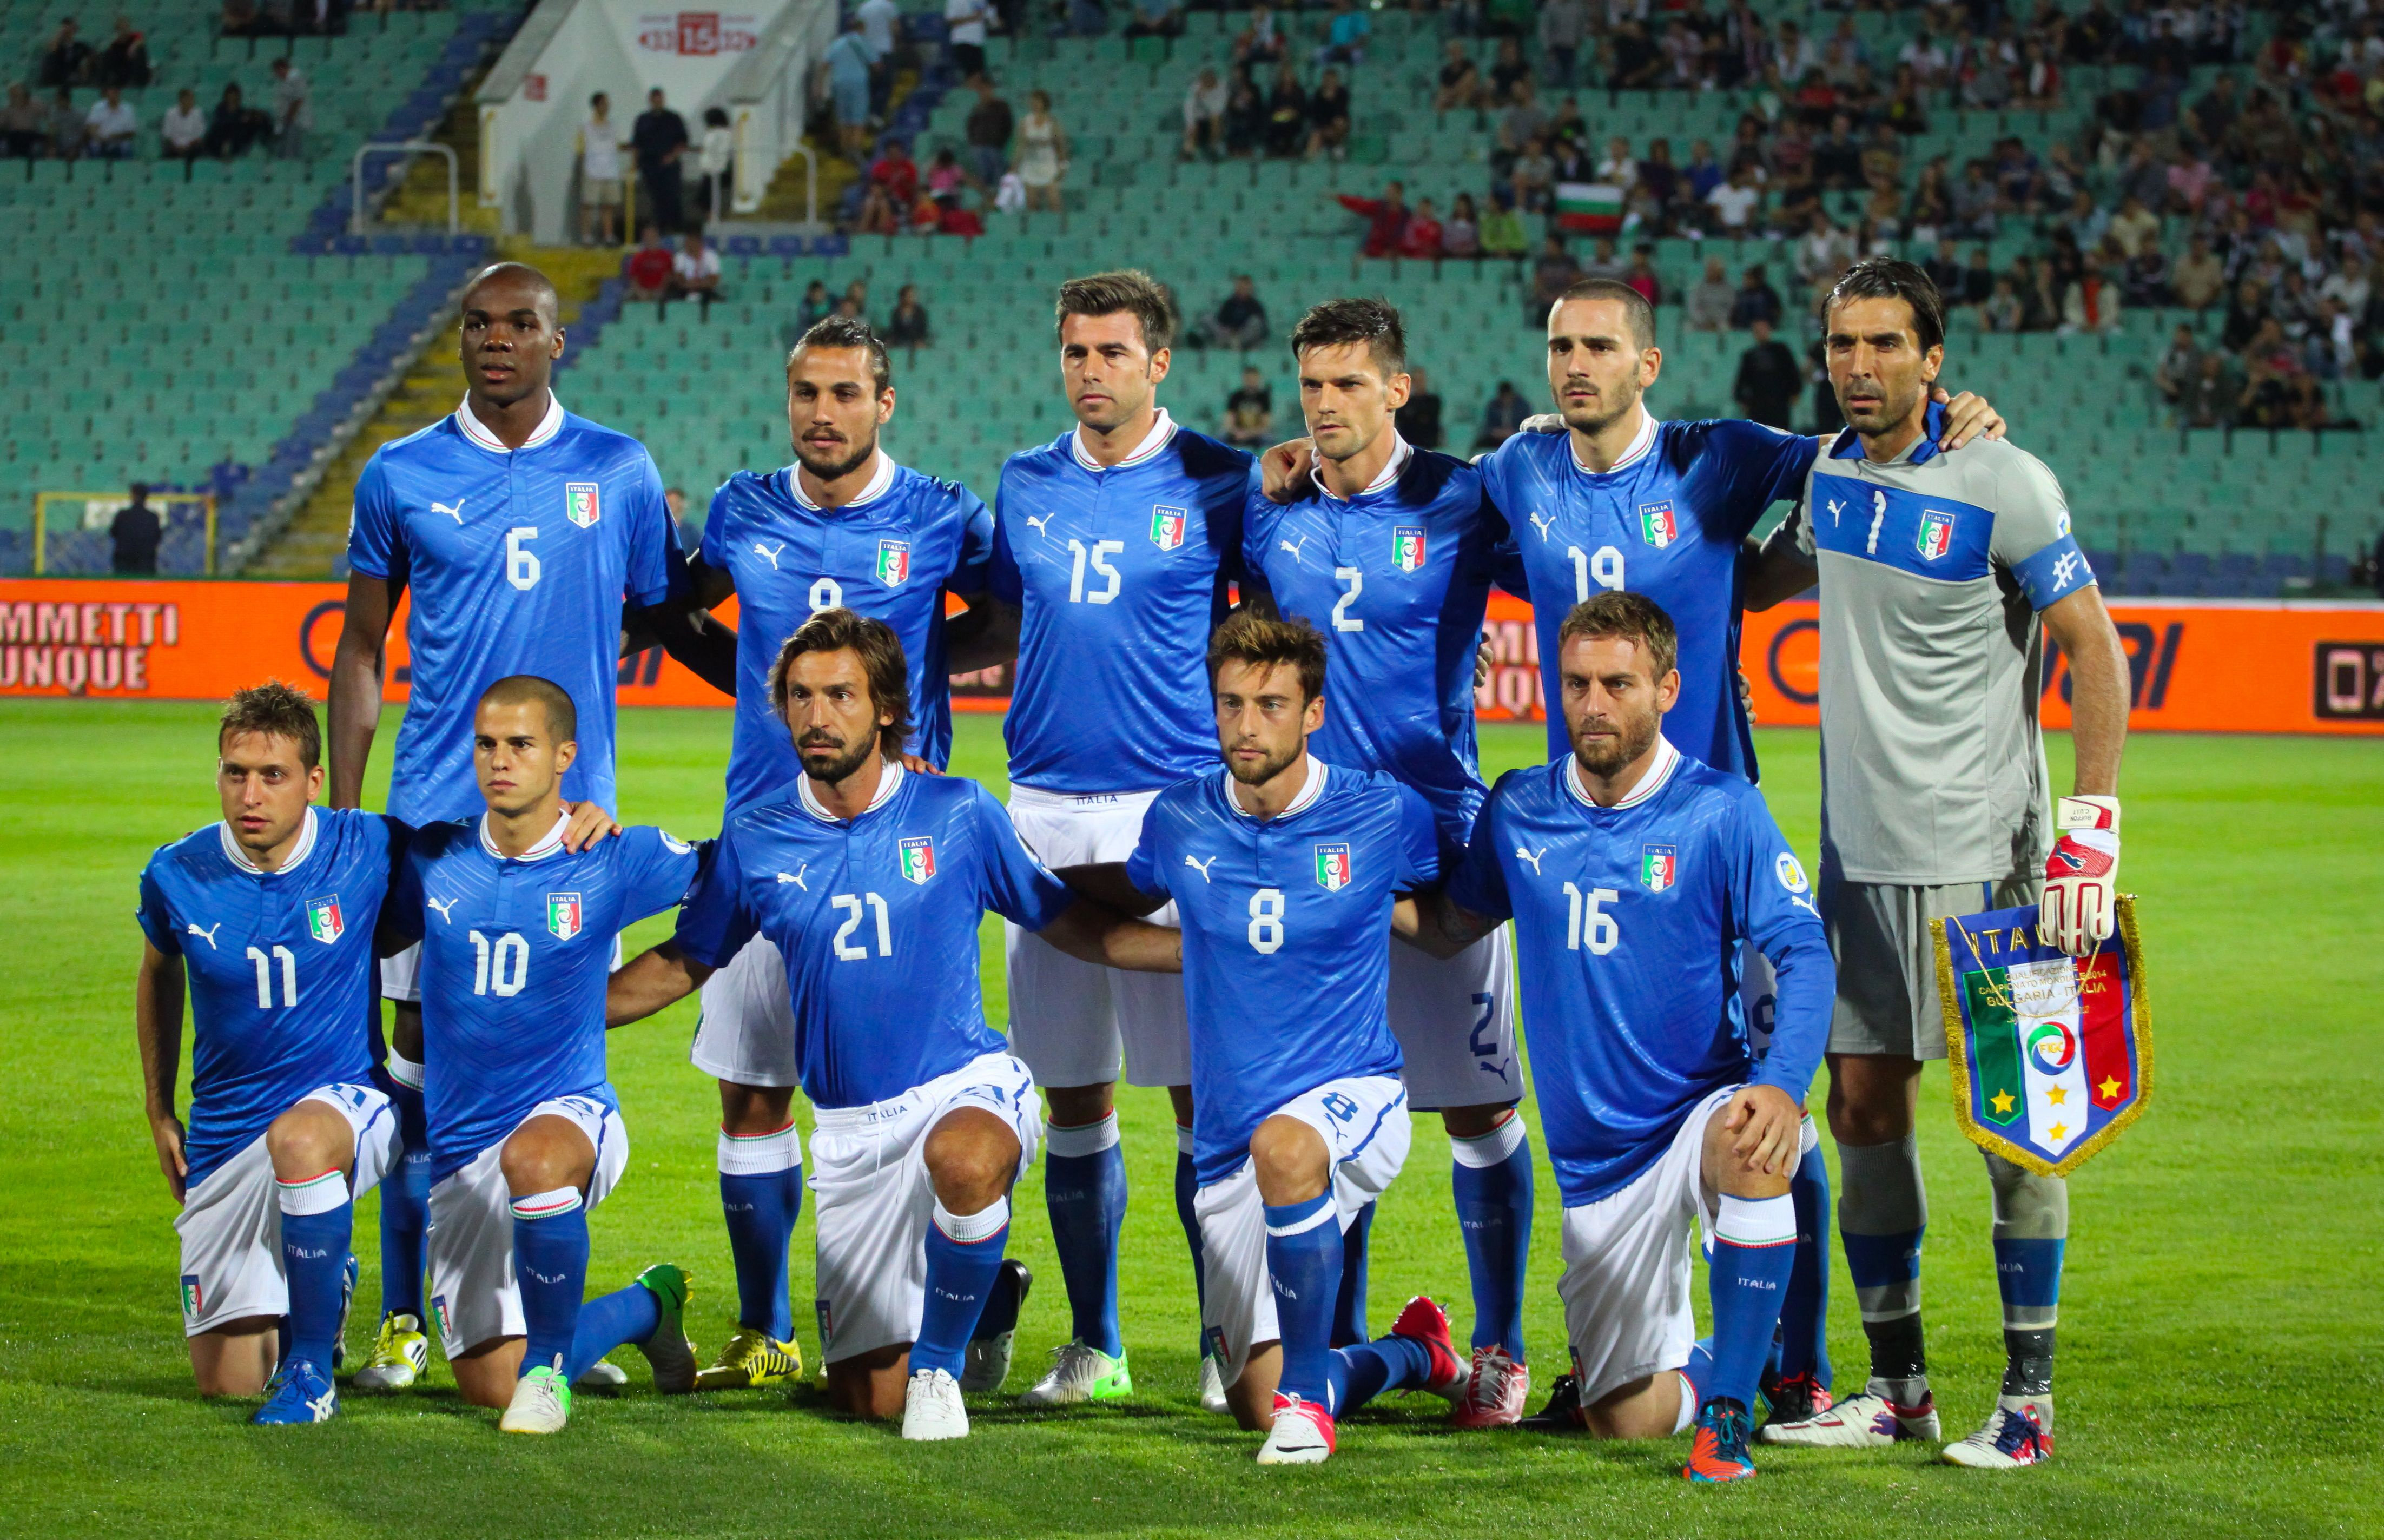 Italy National Football Team Wikipedia The Free Encyclopedia Italy National Football Team Italy World Cup National Football Teams